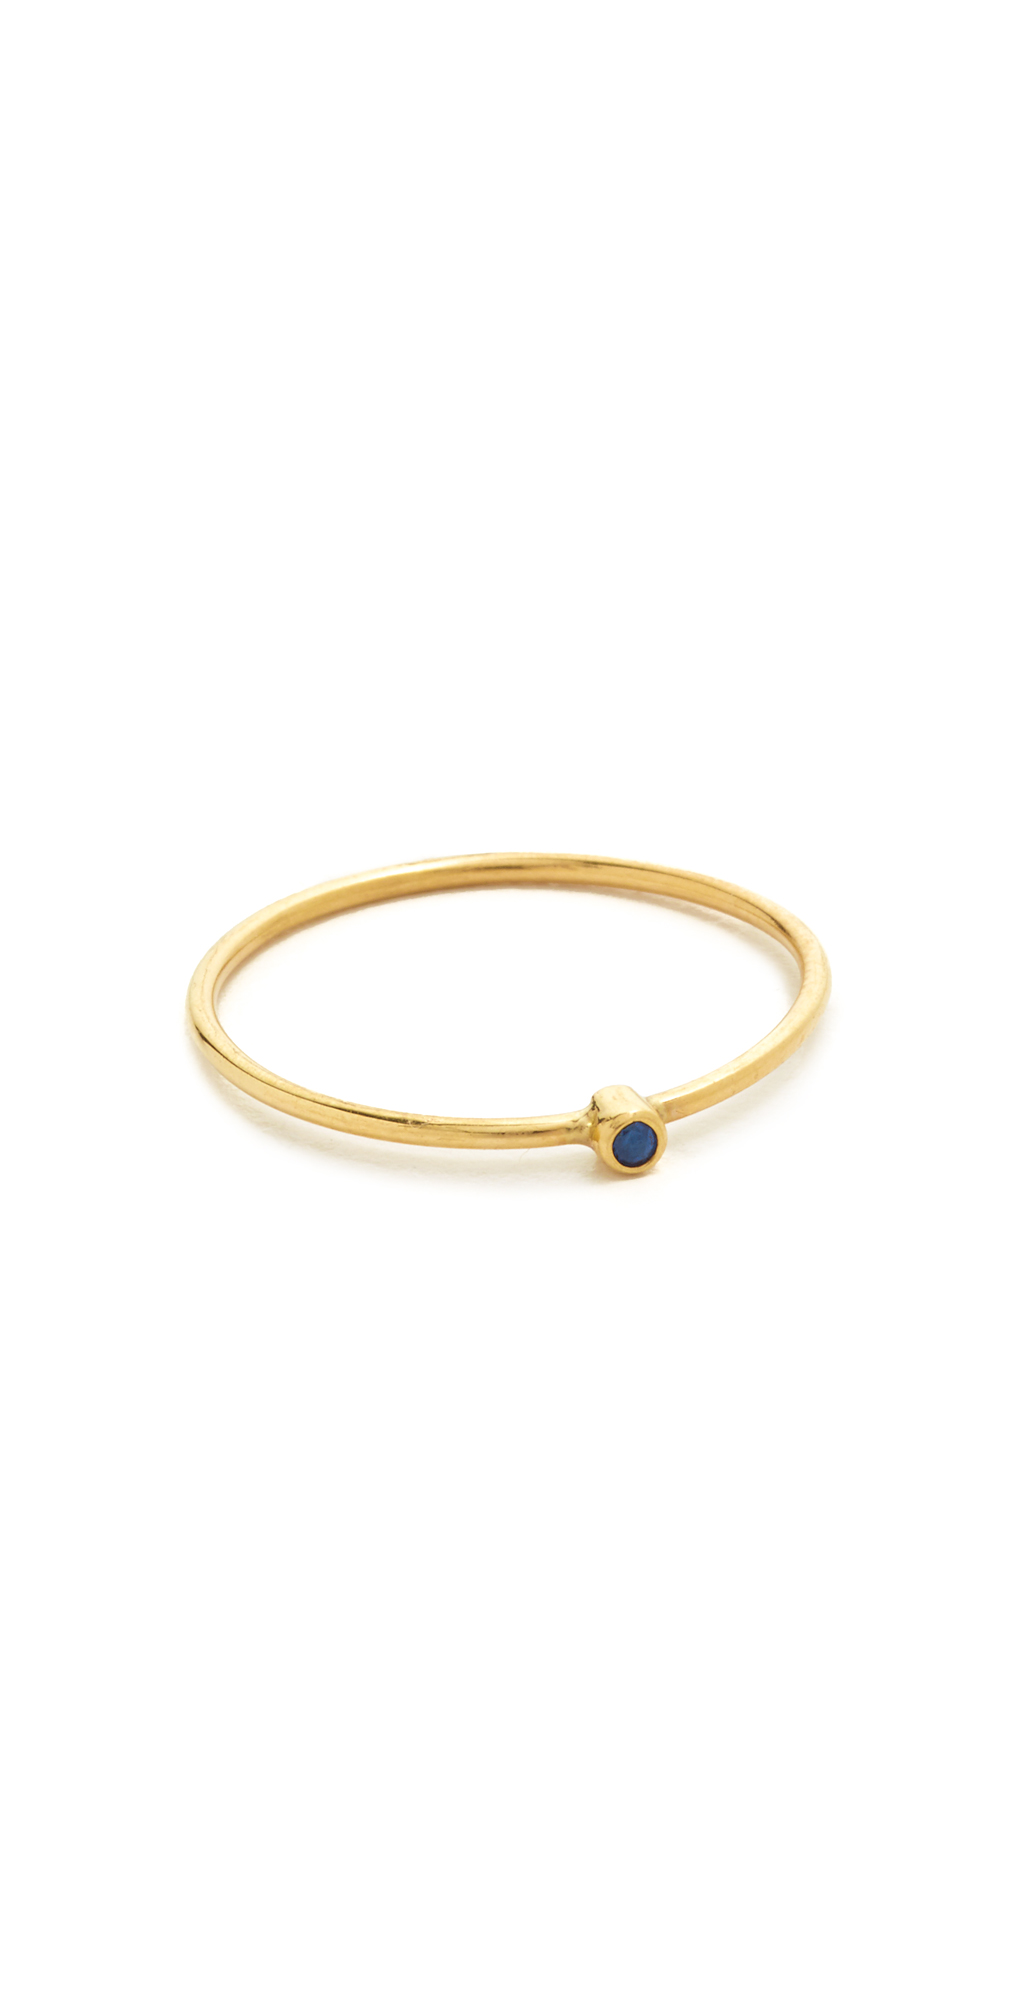 18k Gold Thin Ring with Sapphire Jennifer Meyer Jewelry